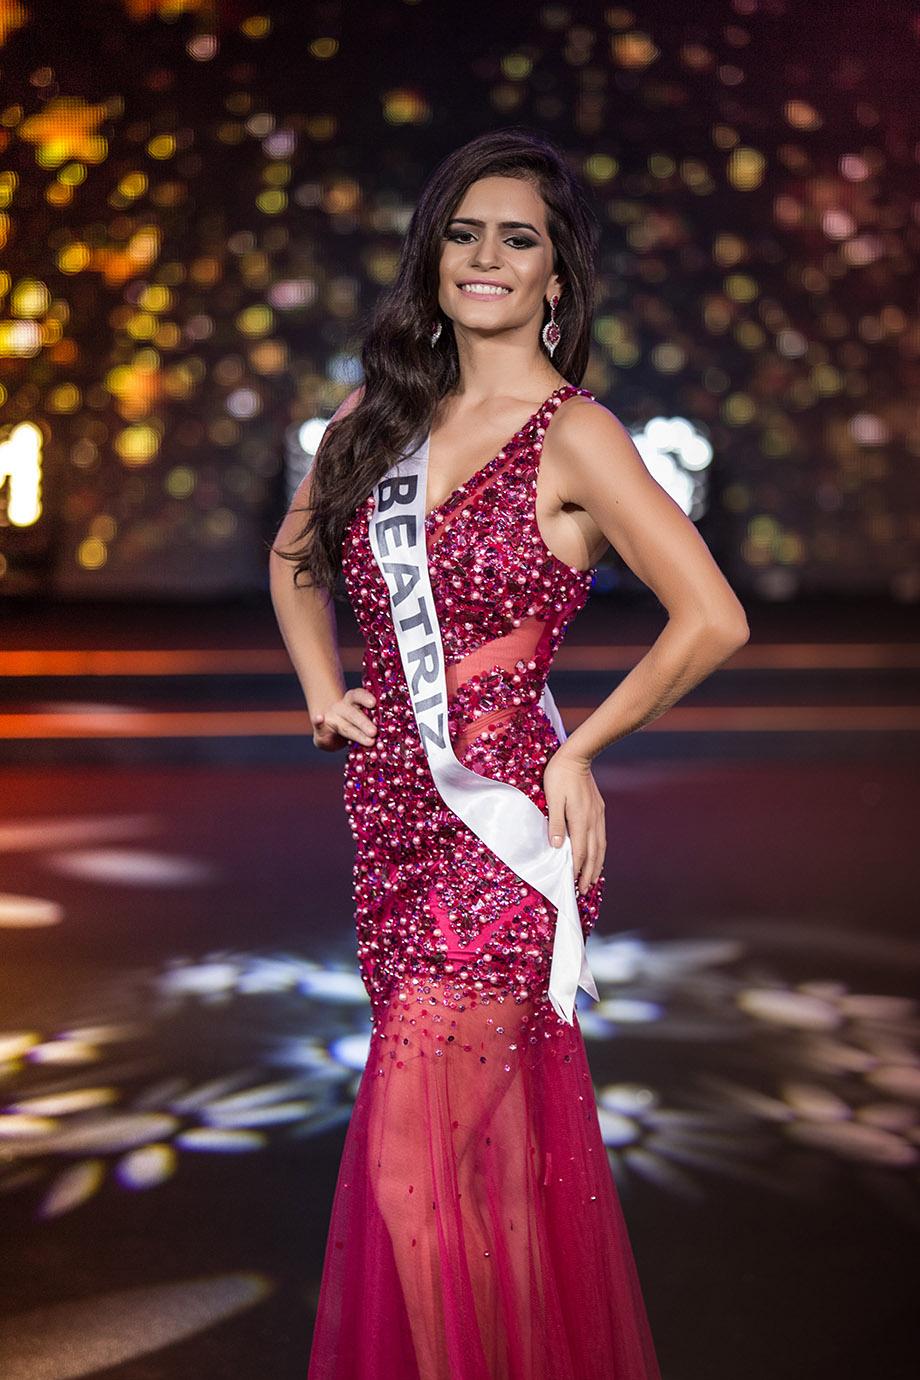 Blog Cris Moreira - Miss Fortaleza 2016 - 14